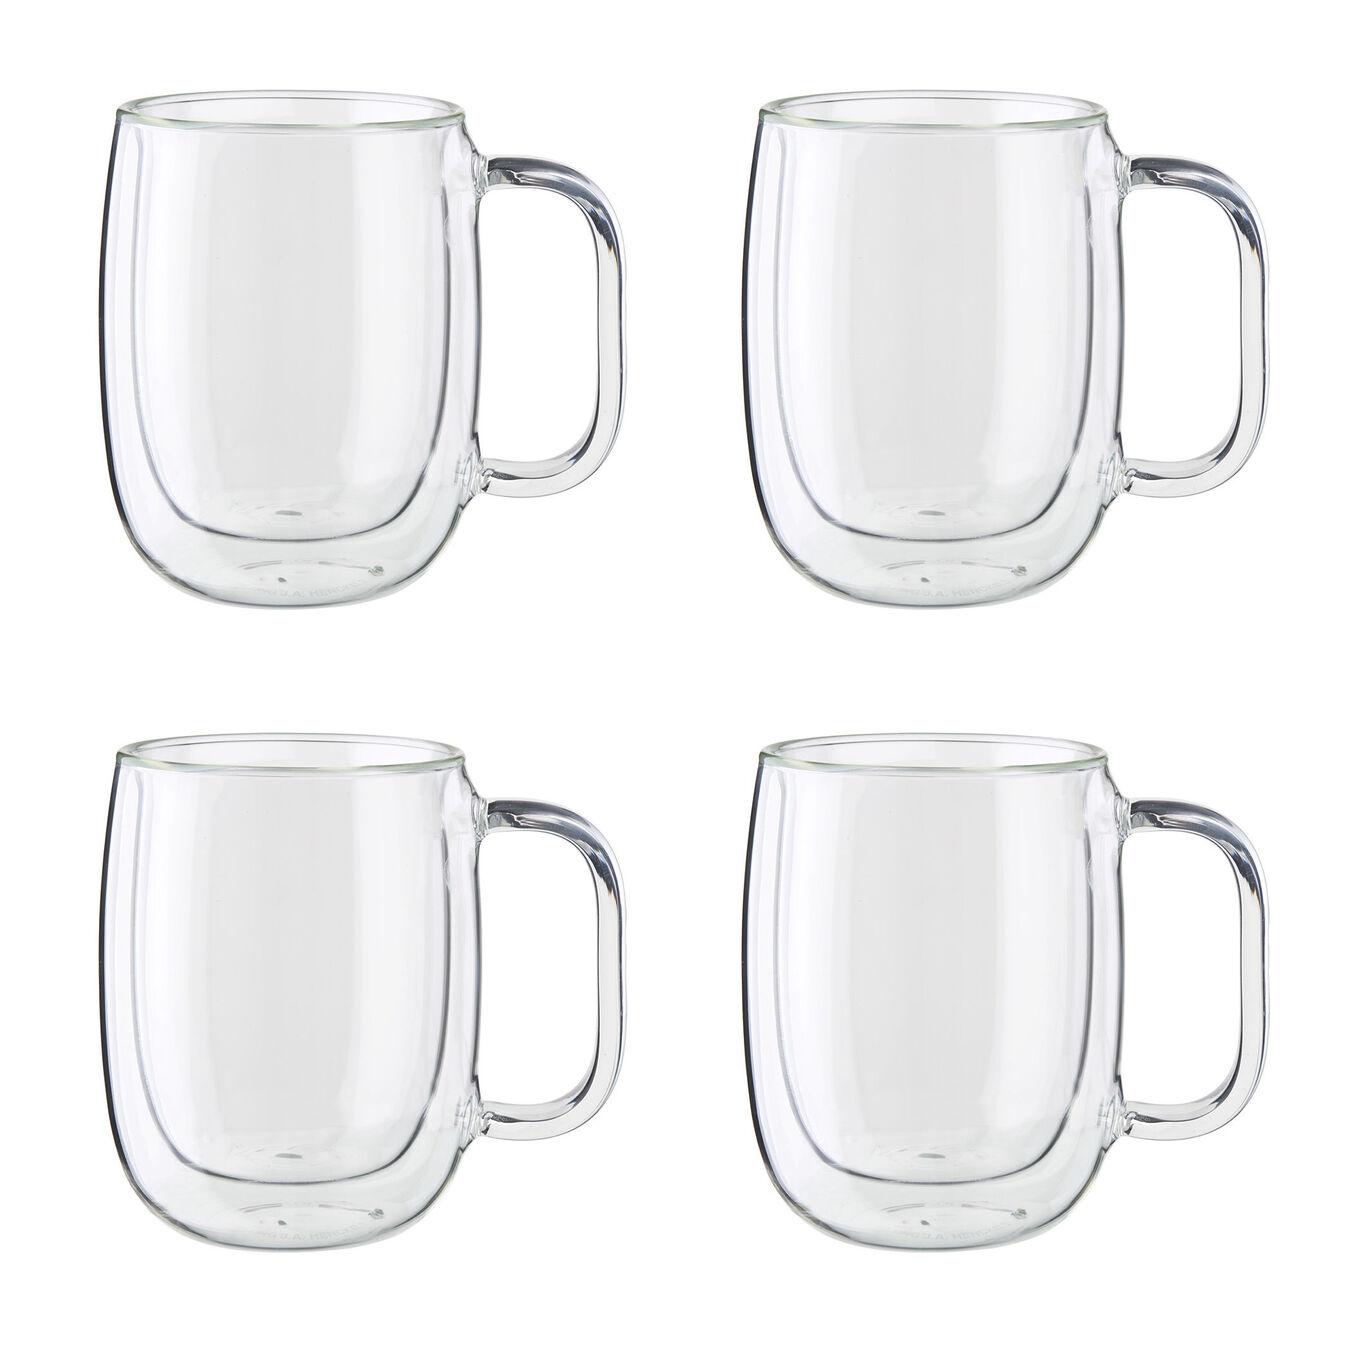 4-pc Double-Wall Glass Coffee Mug Set,,large 1